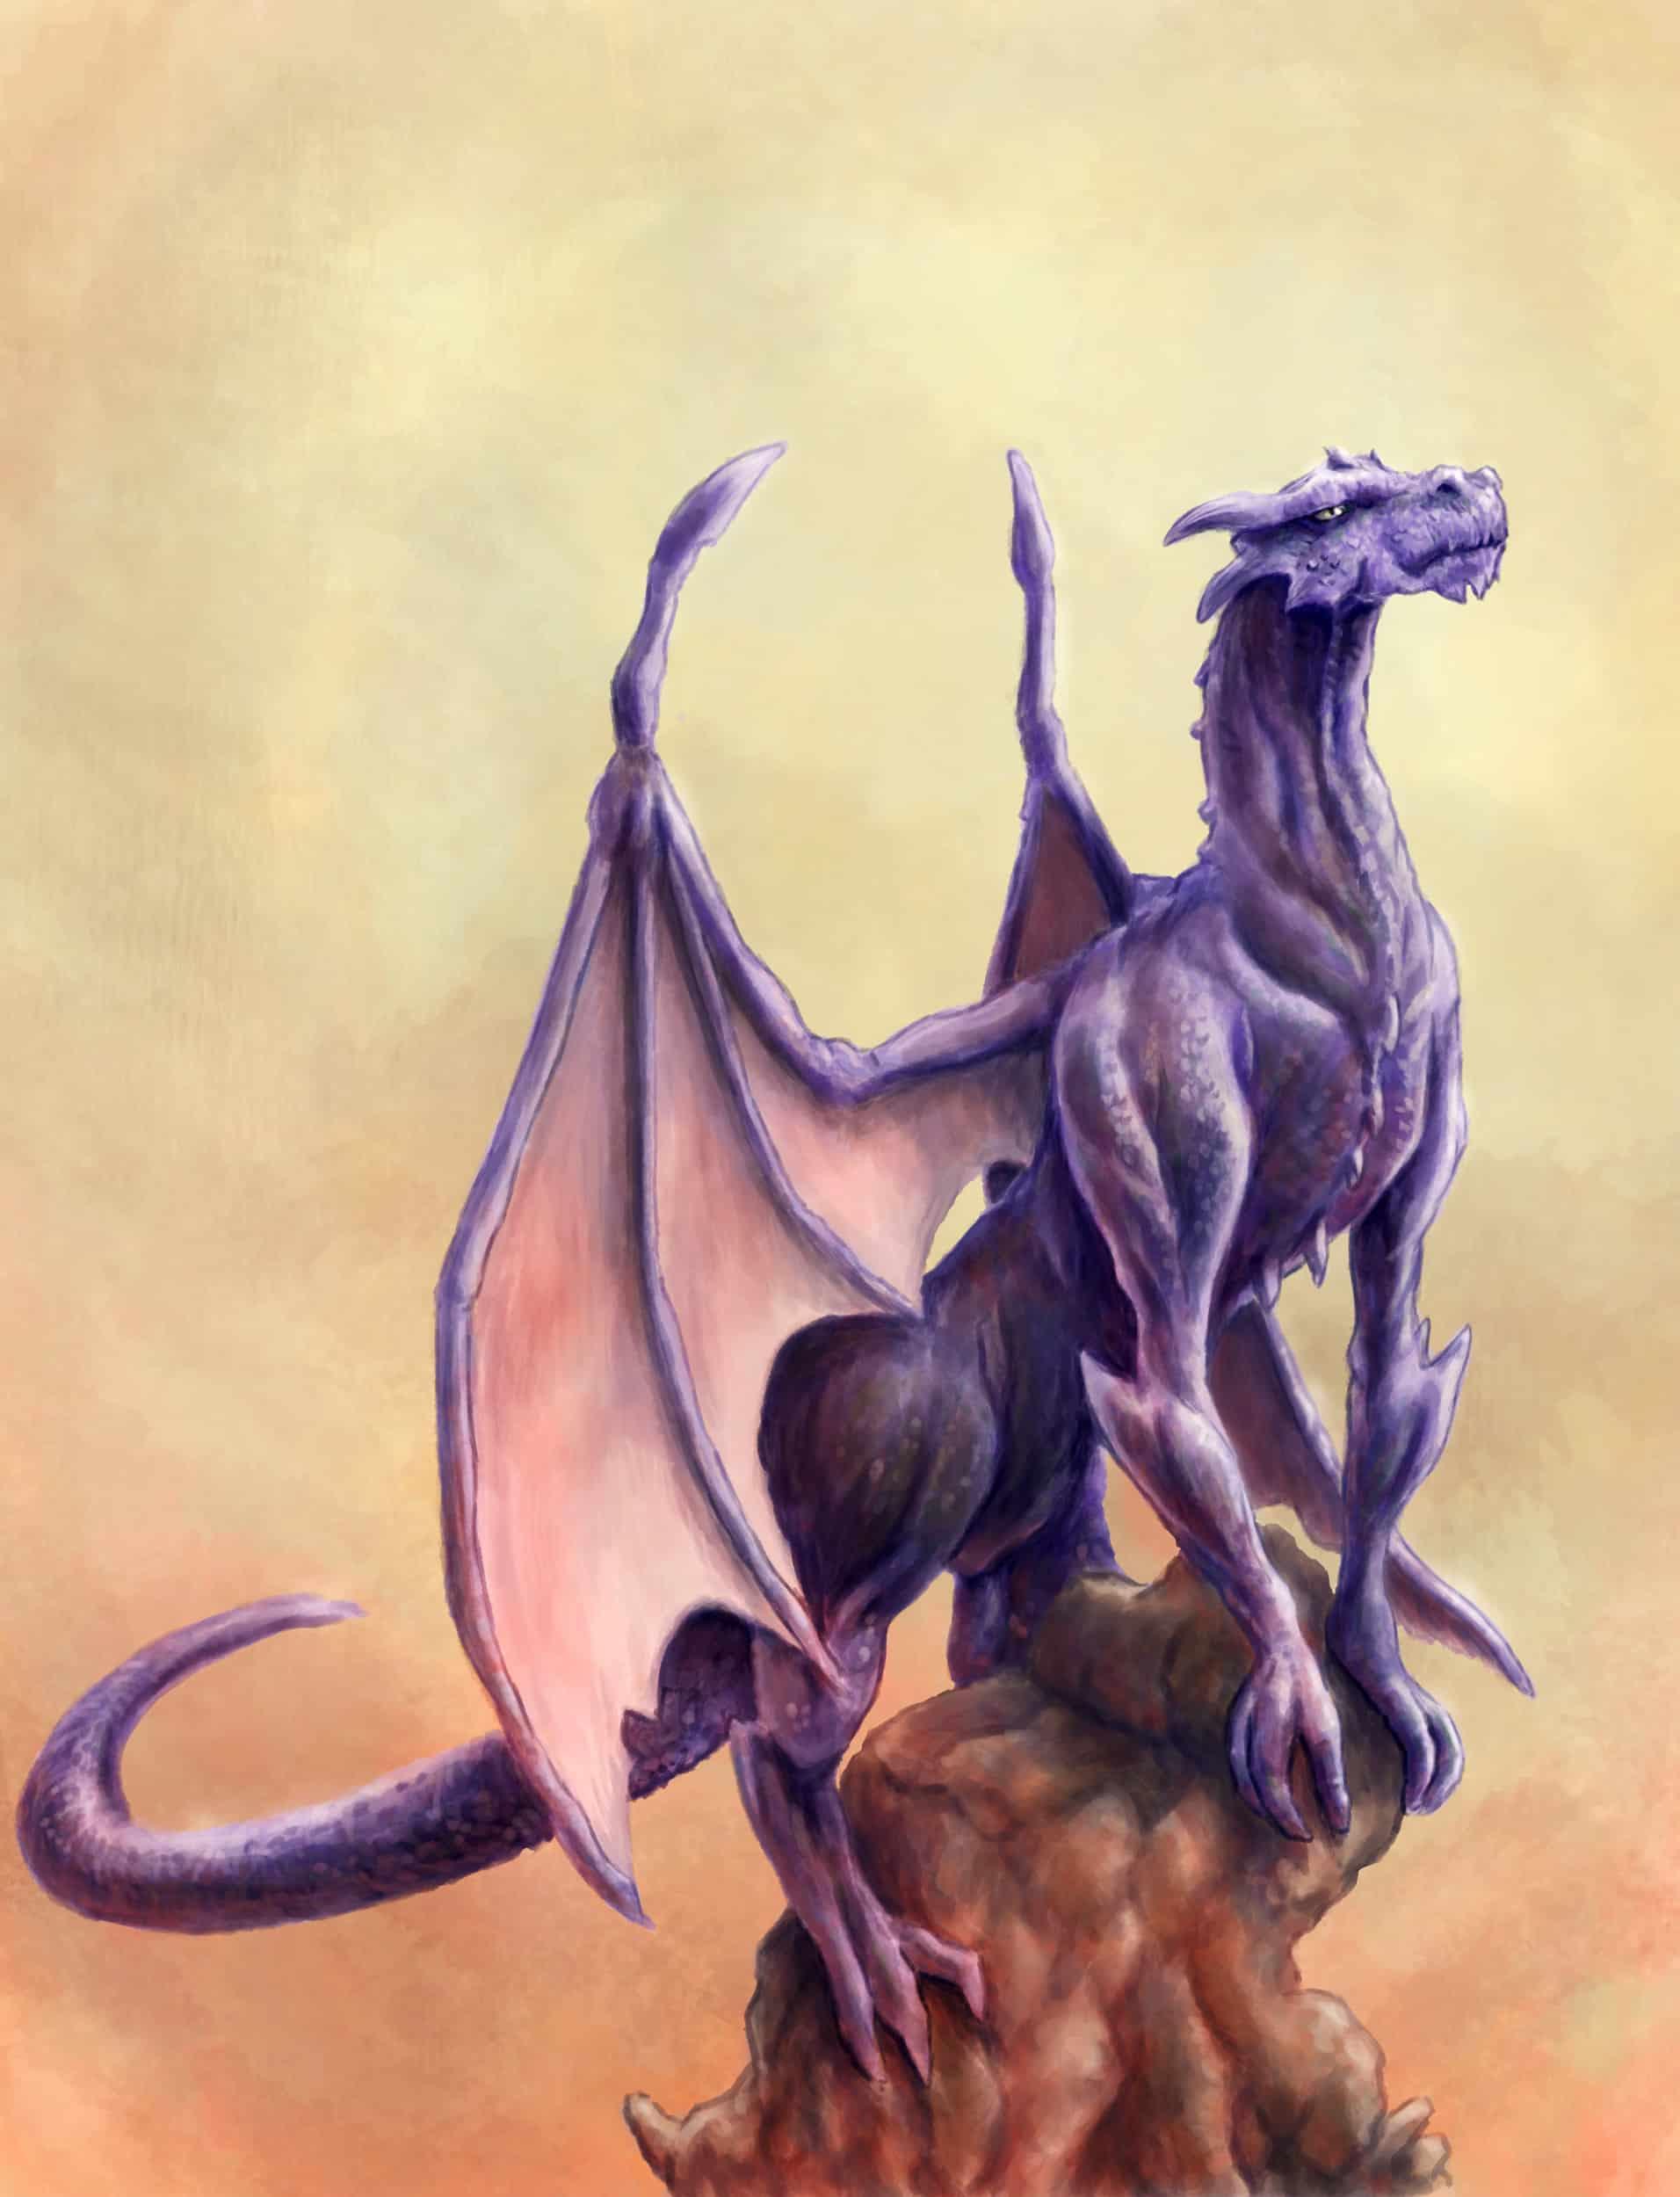 Purple dragon dream meaning